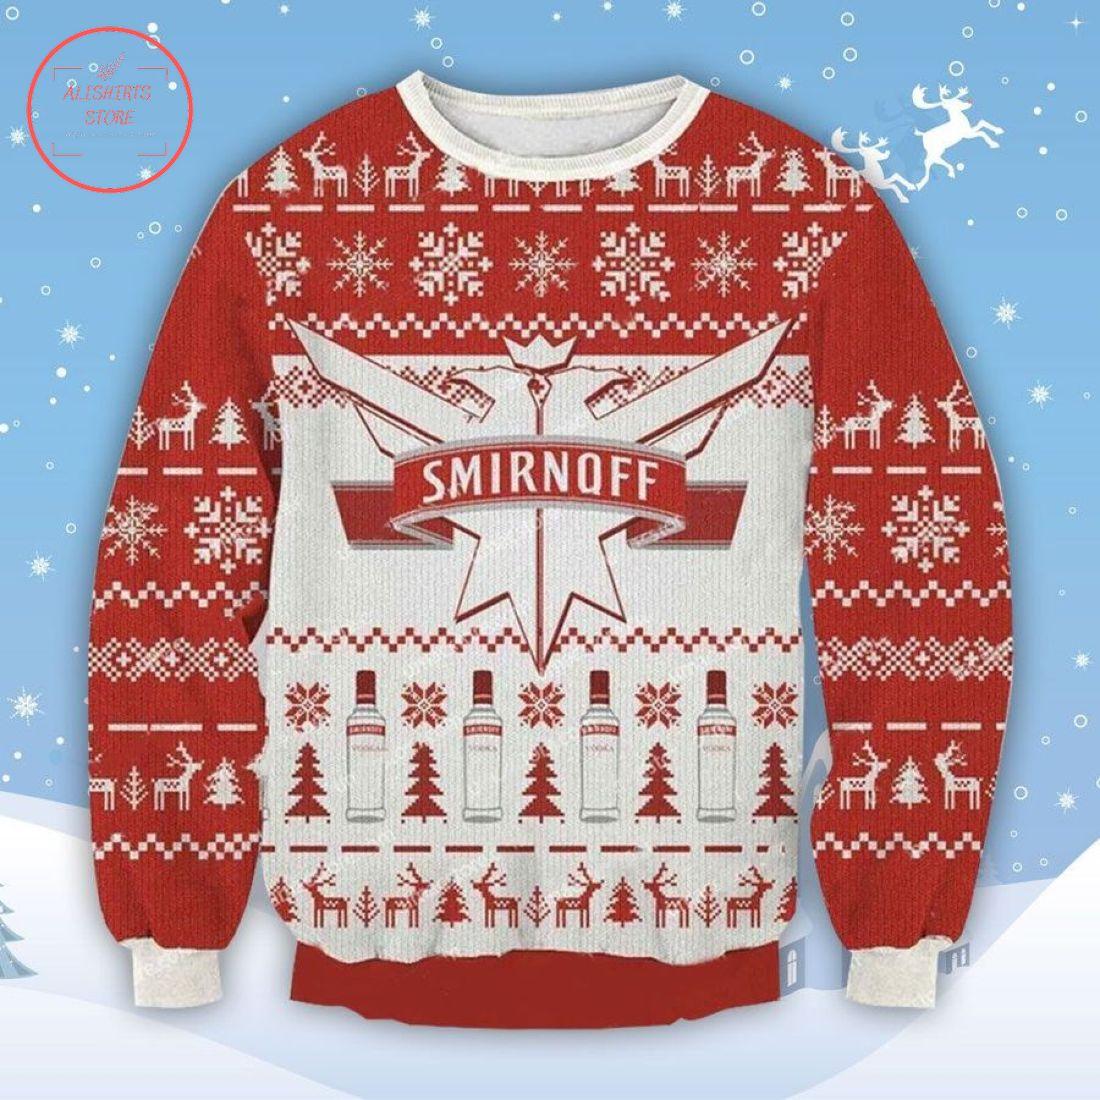 Smirnoff Vodka Ugly Christmas Sweater